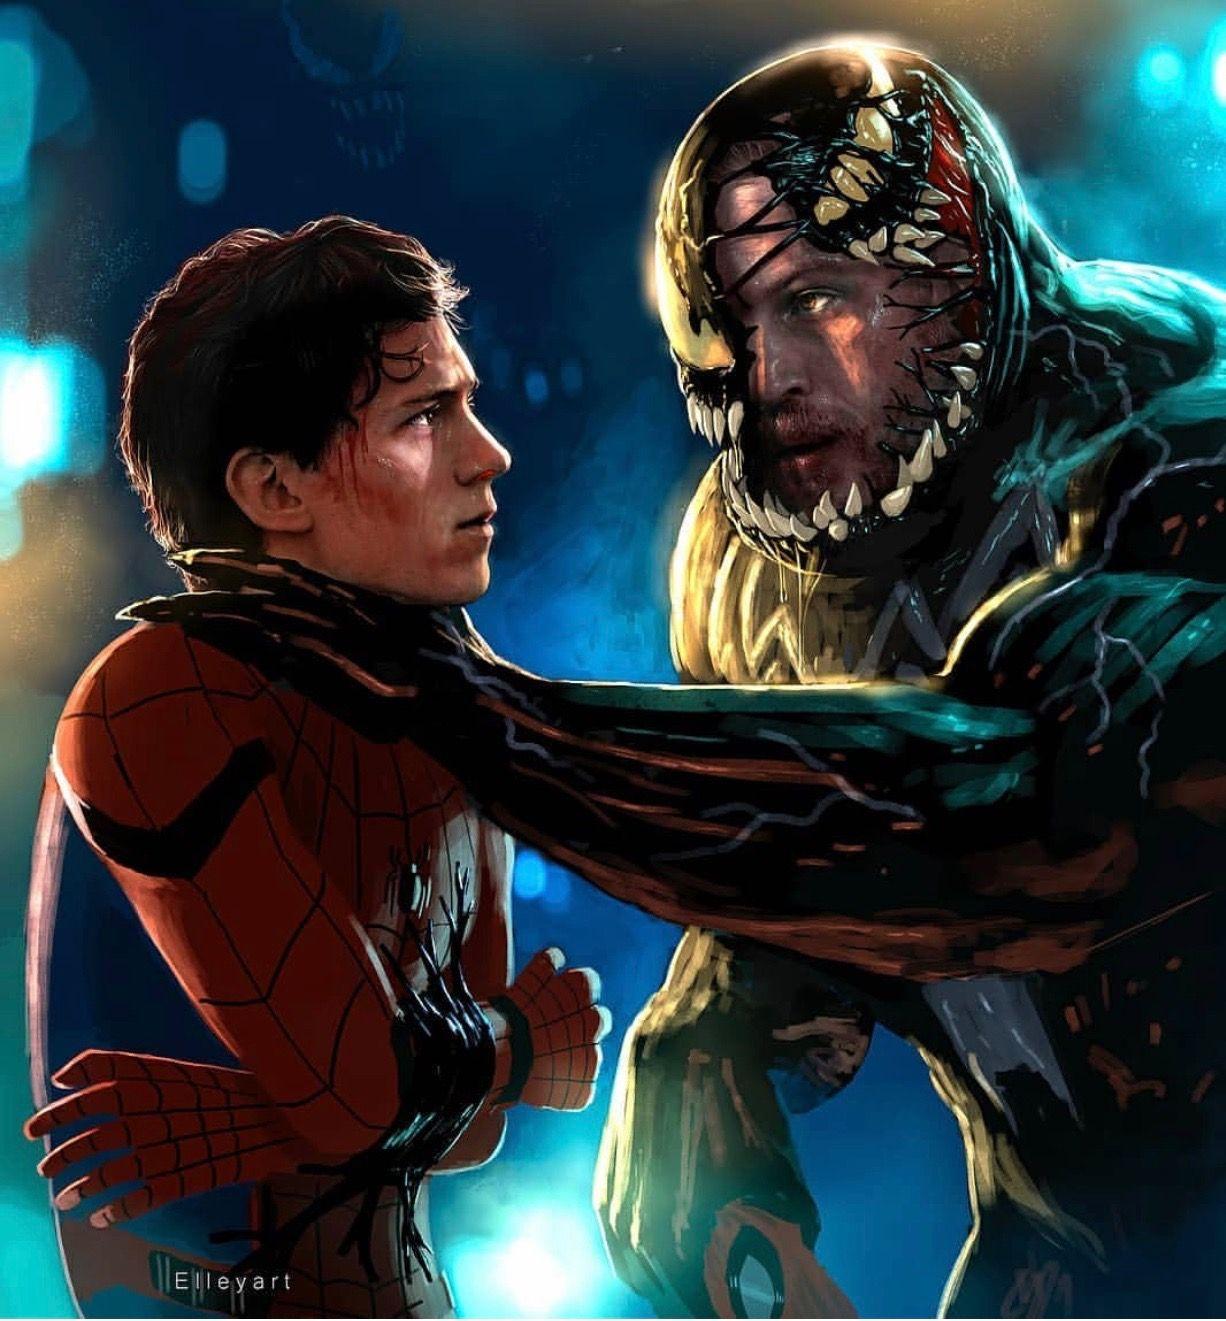 spiderman vs venom (5)   marvel comics   spiderman, marvel, venom